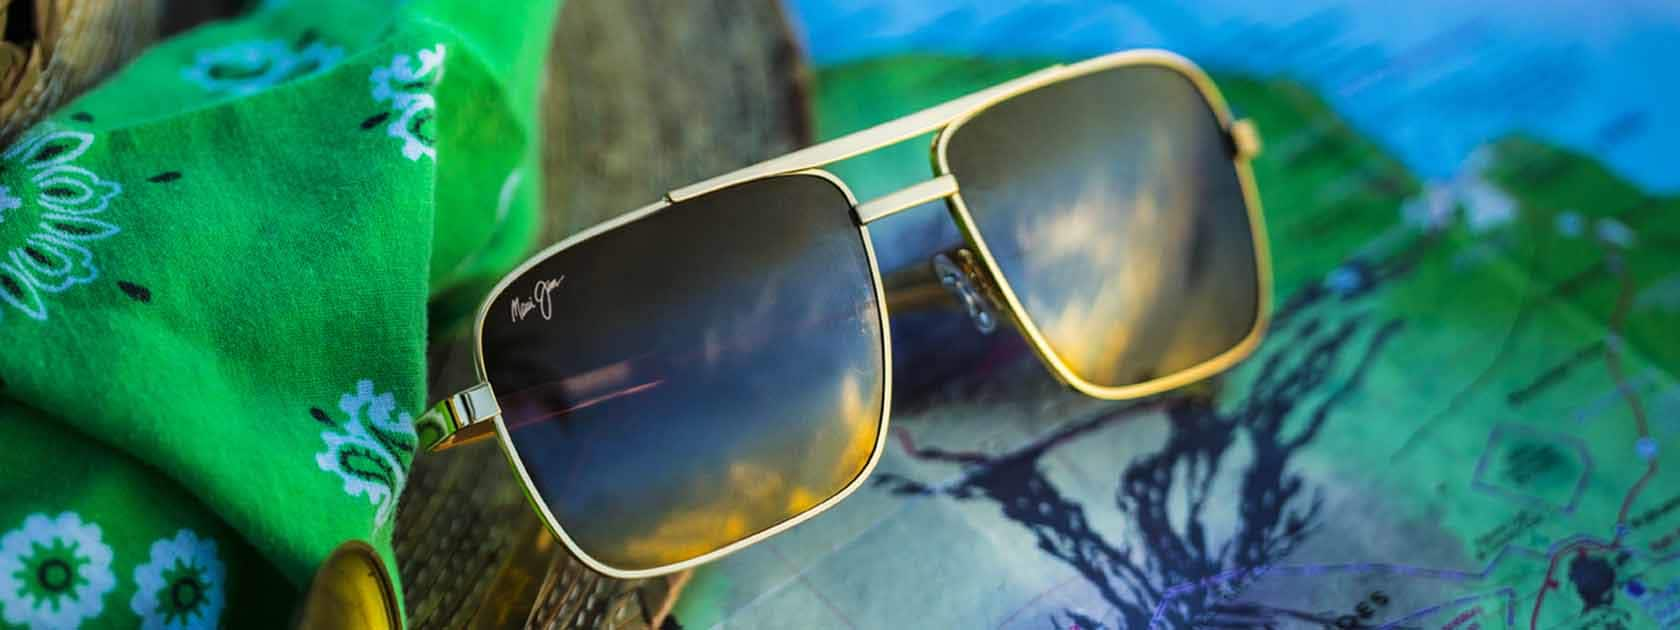 481e4b839ac5 Maui Jim sunglasses ...